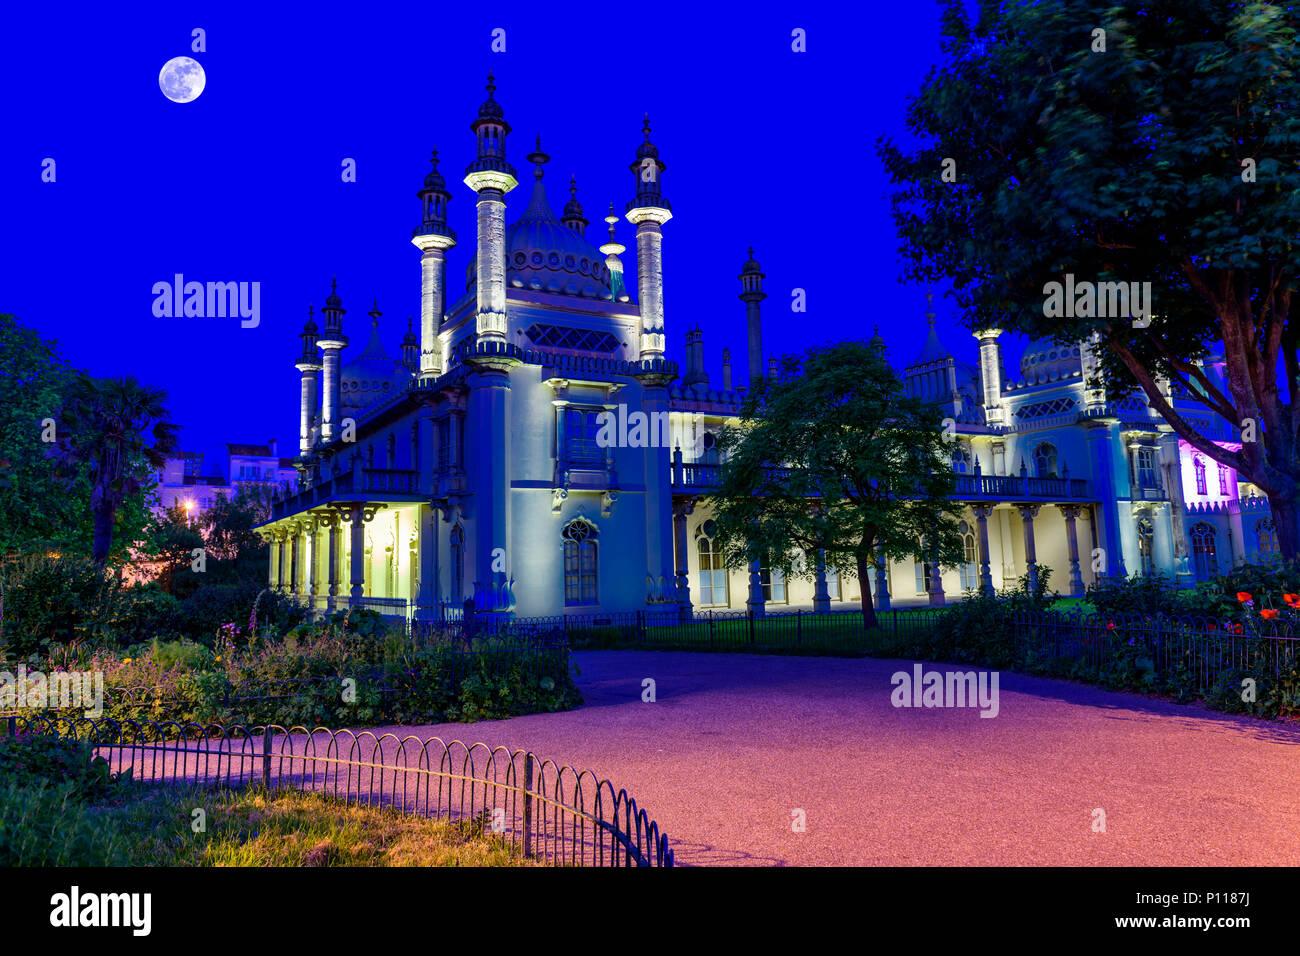 Royal Pavilion, Brighton en penumbra. Imagen De Stock